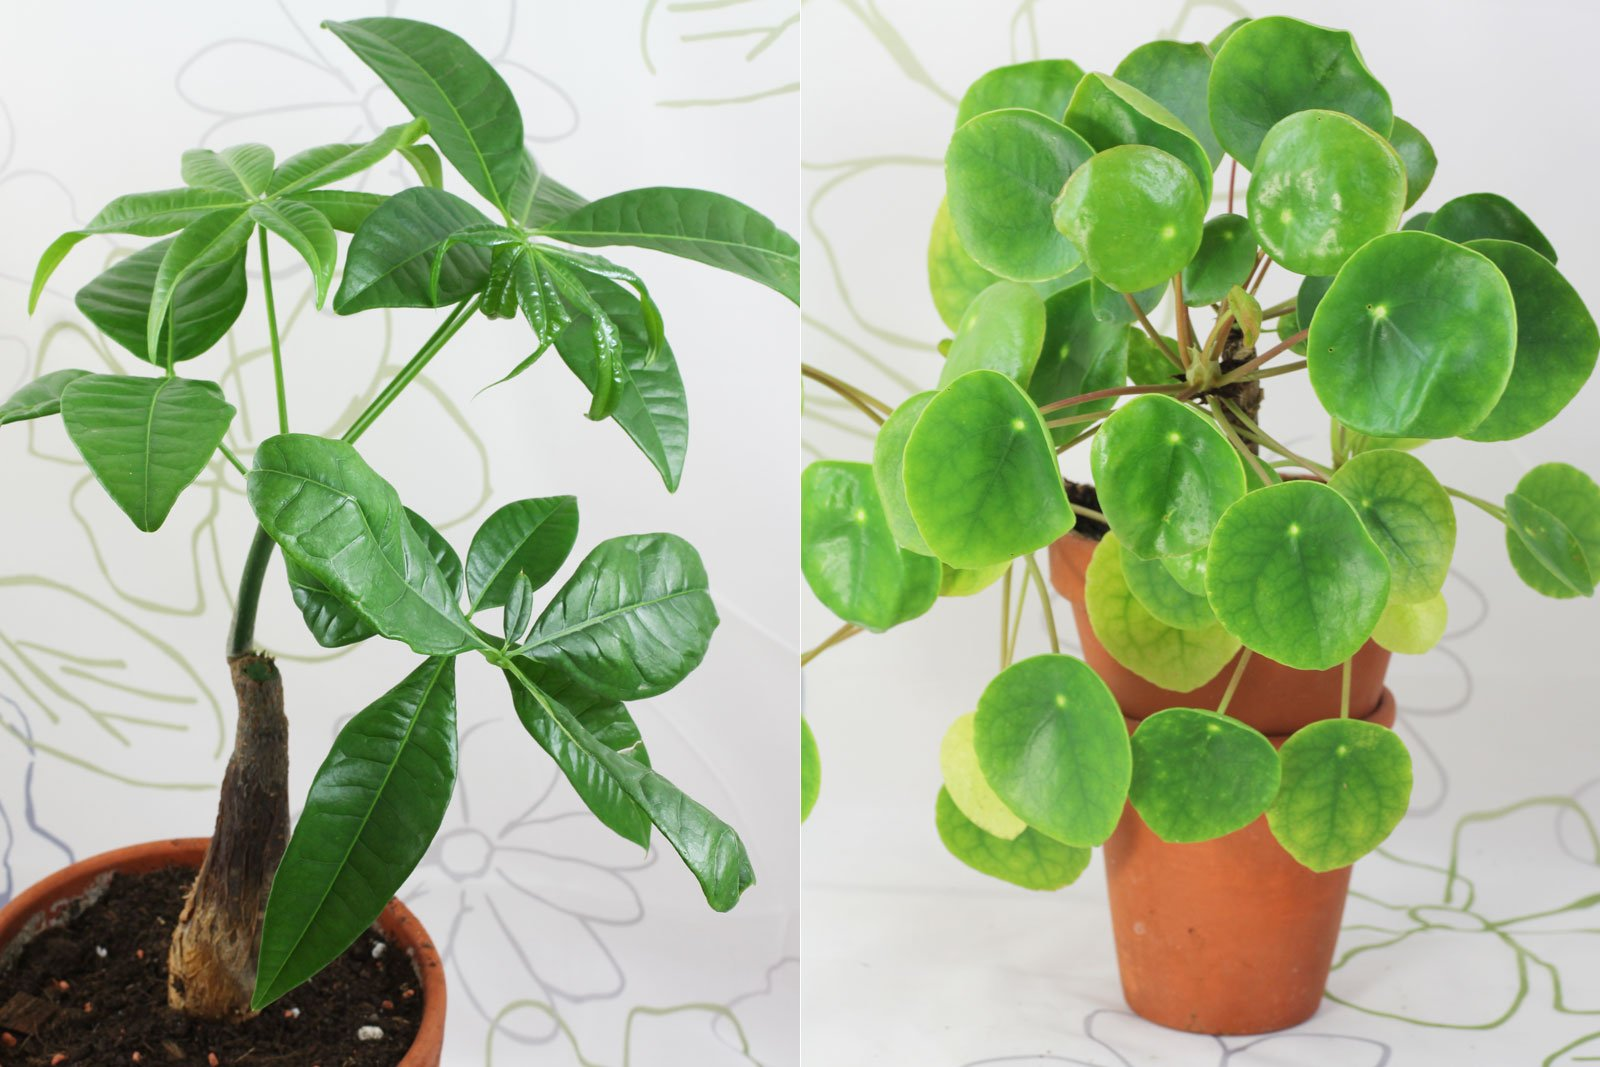 Pachira und Ufopflanze